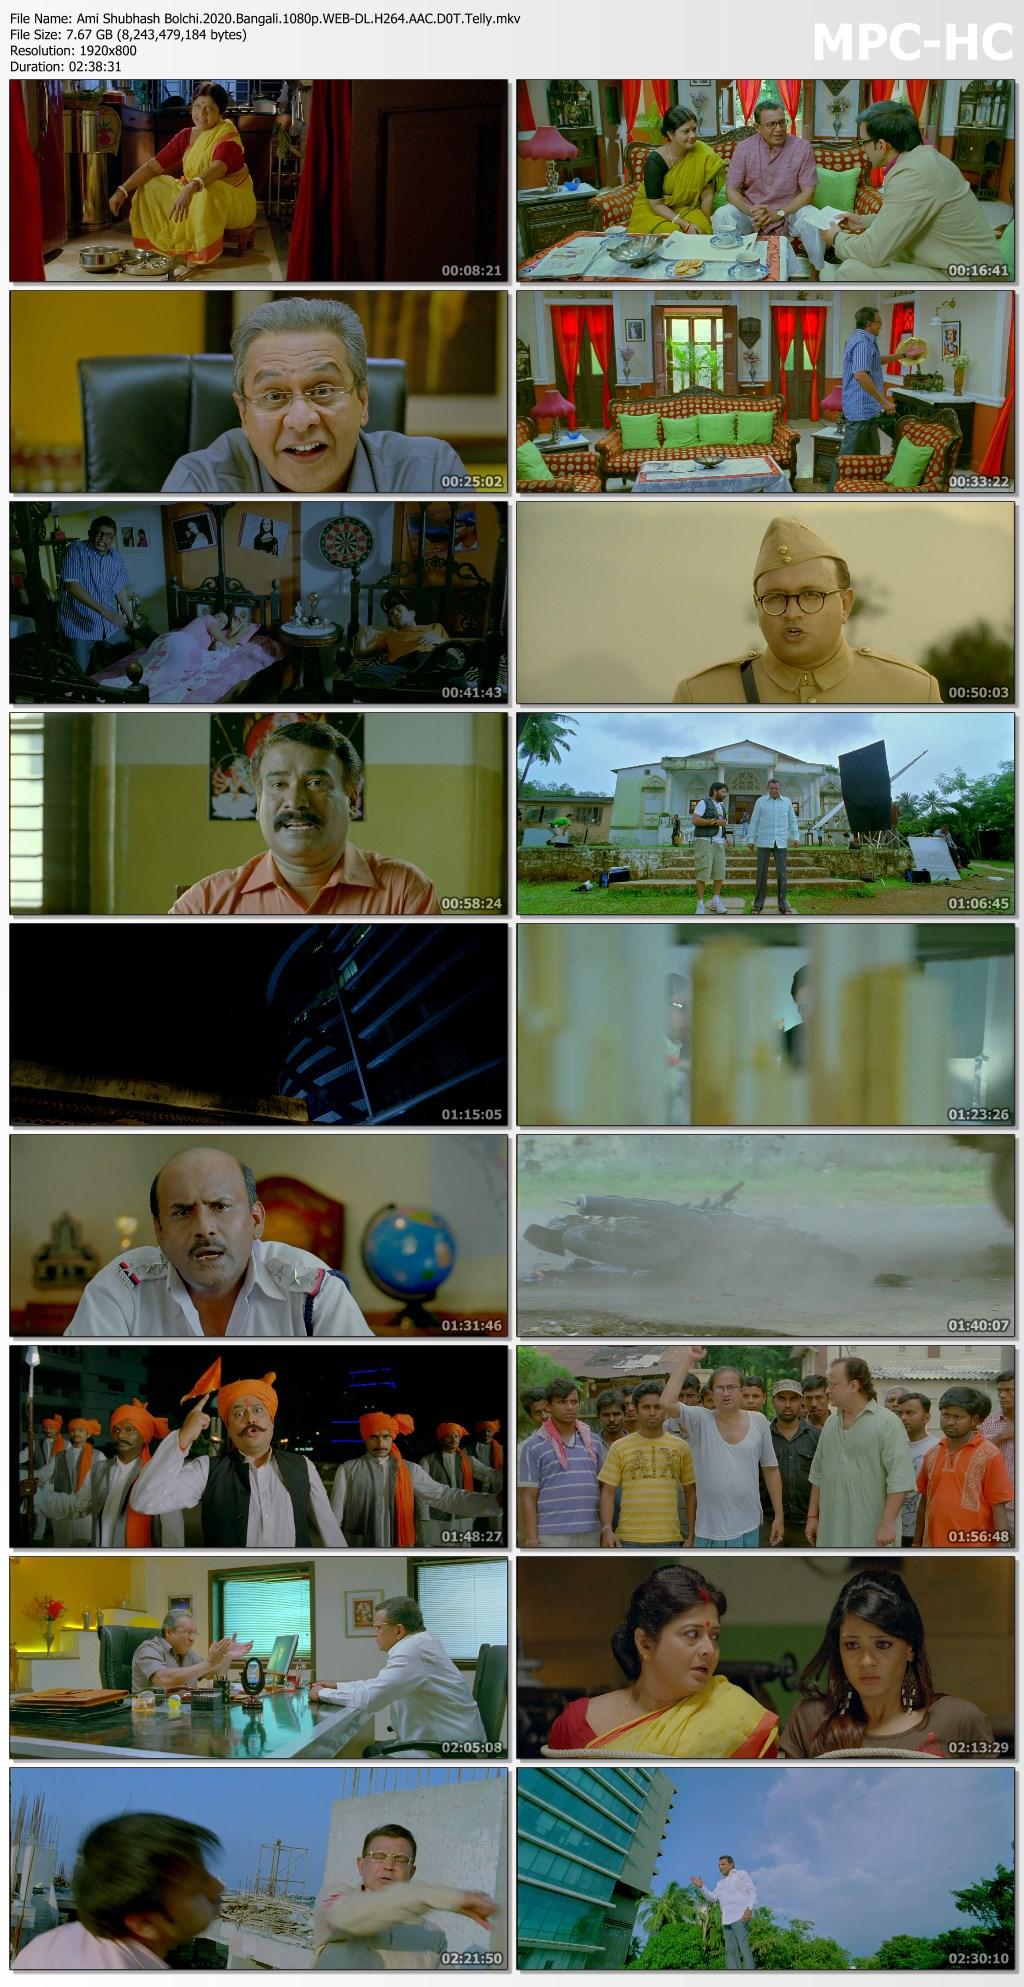 Ami Shubhash Bolchi.2020.Bangali.1080p.WEB DL.H264.AAC.D0T.Telly.mkv thumbs